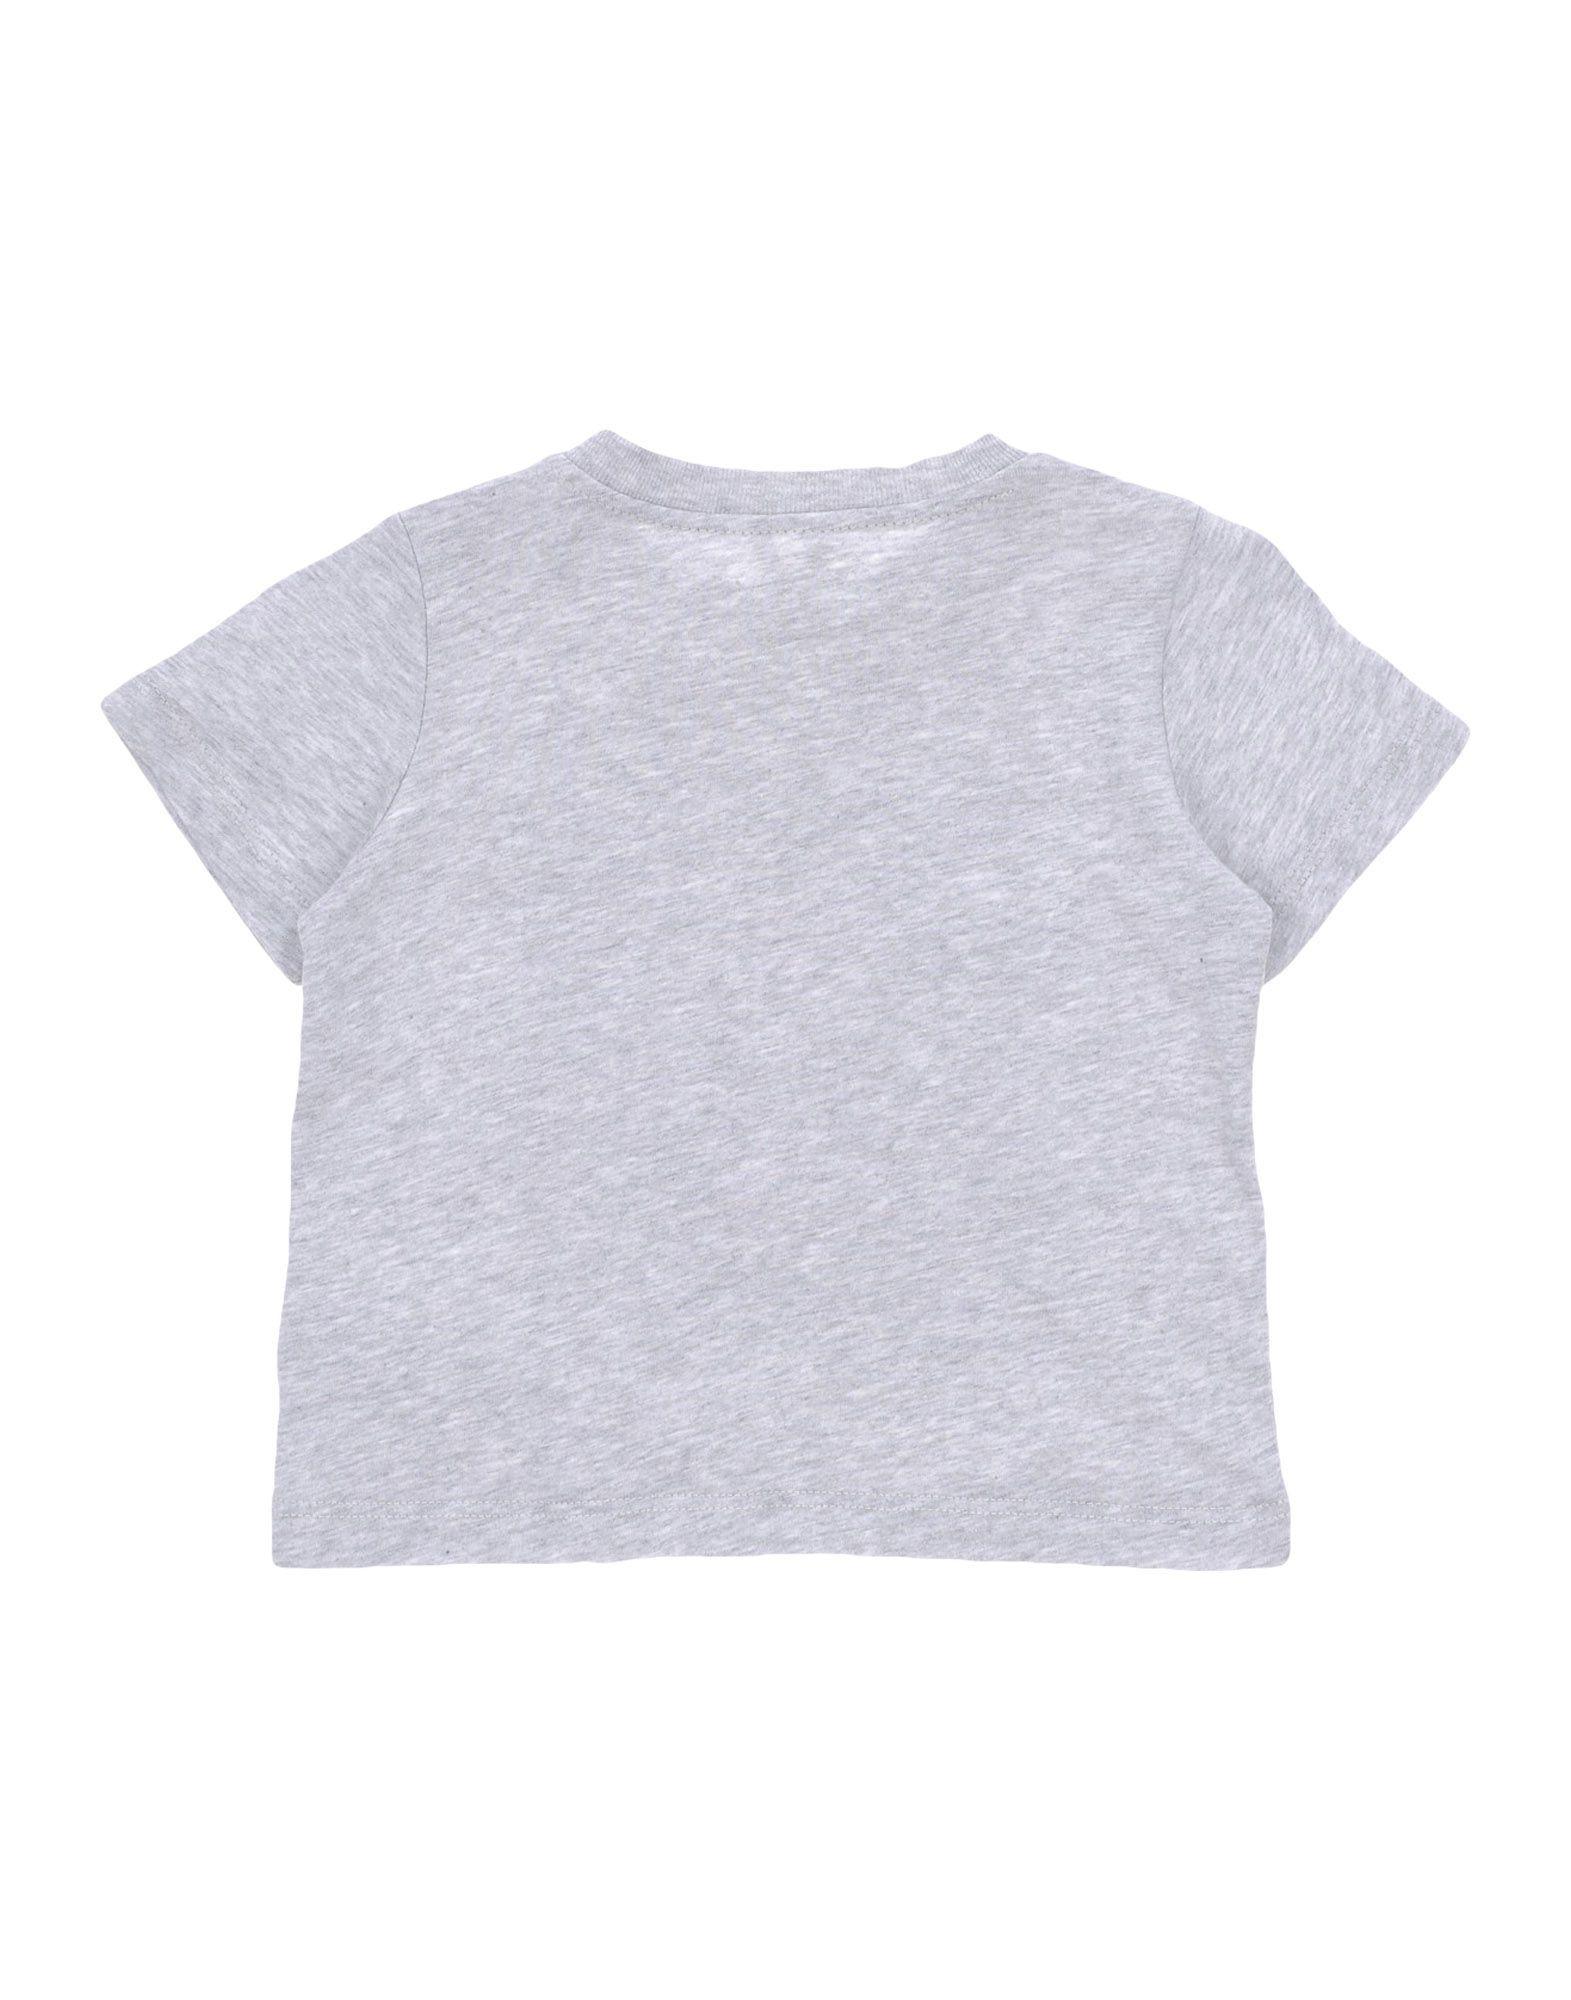 TOPWEAR Stella Mccartney Kids Light grey Woman Cotton